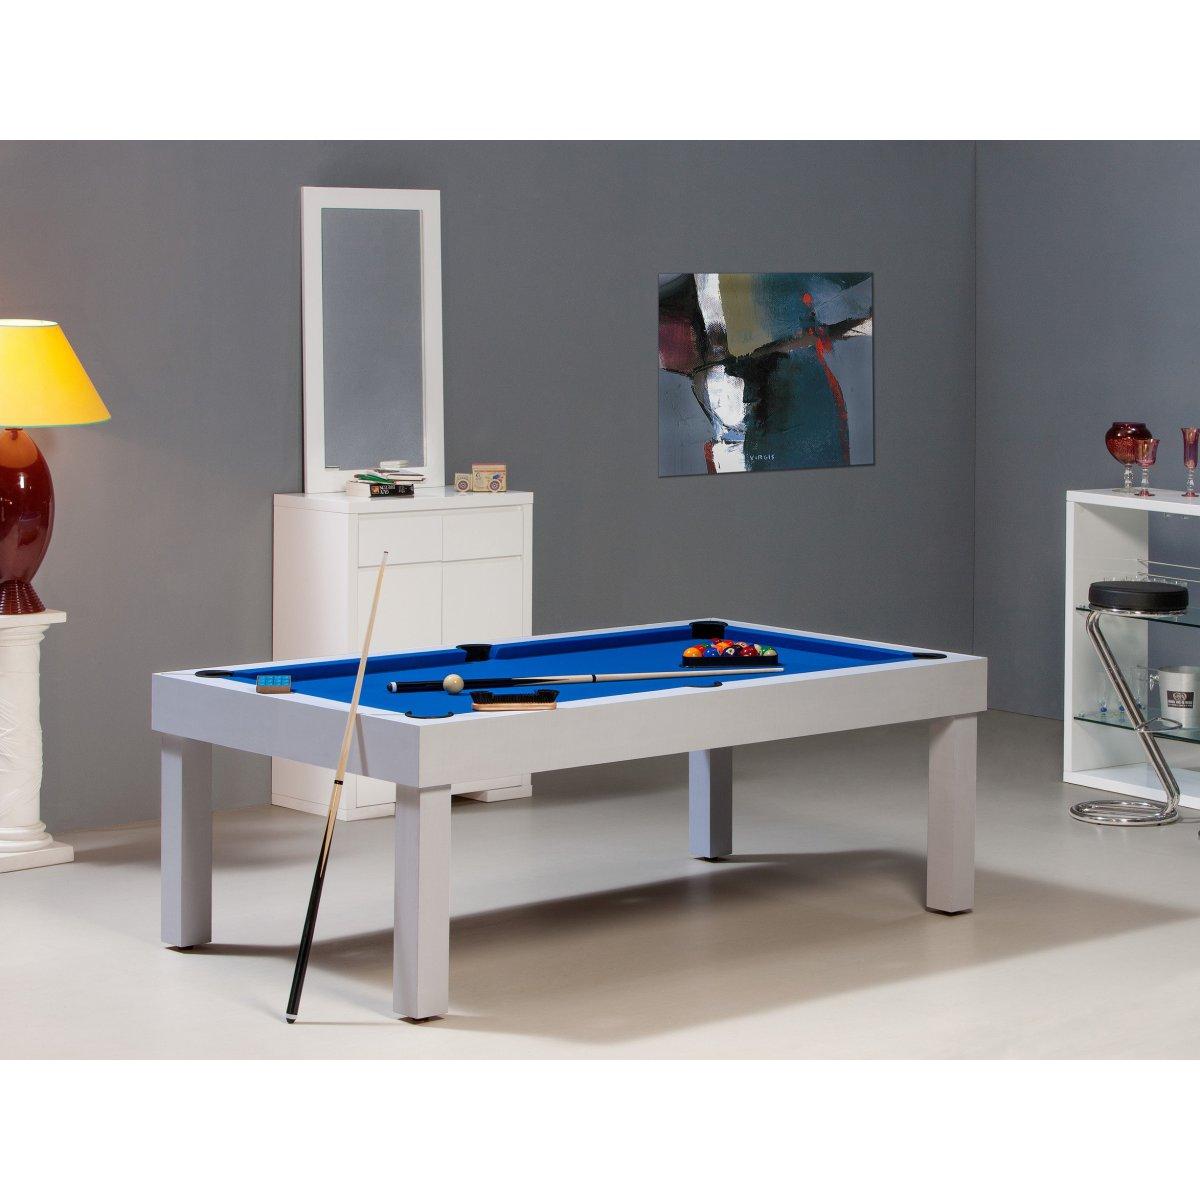 banc pour table billard billard table a manger table billard convertible et billard table a. Black Bedroom Furniture Sets. Home Design Ideas